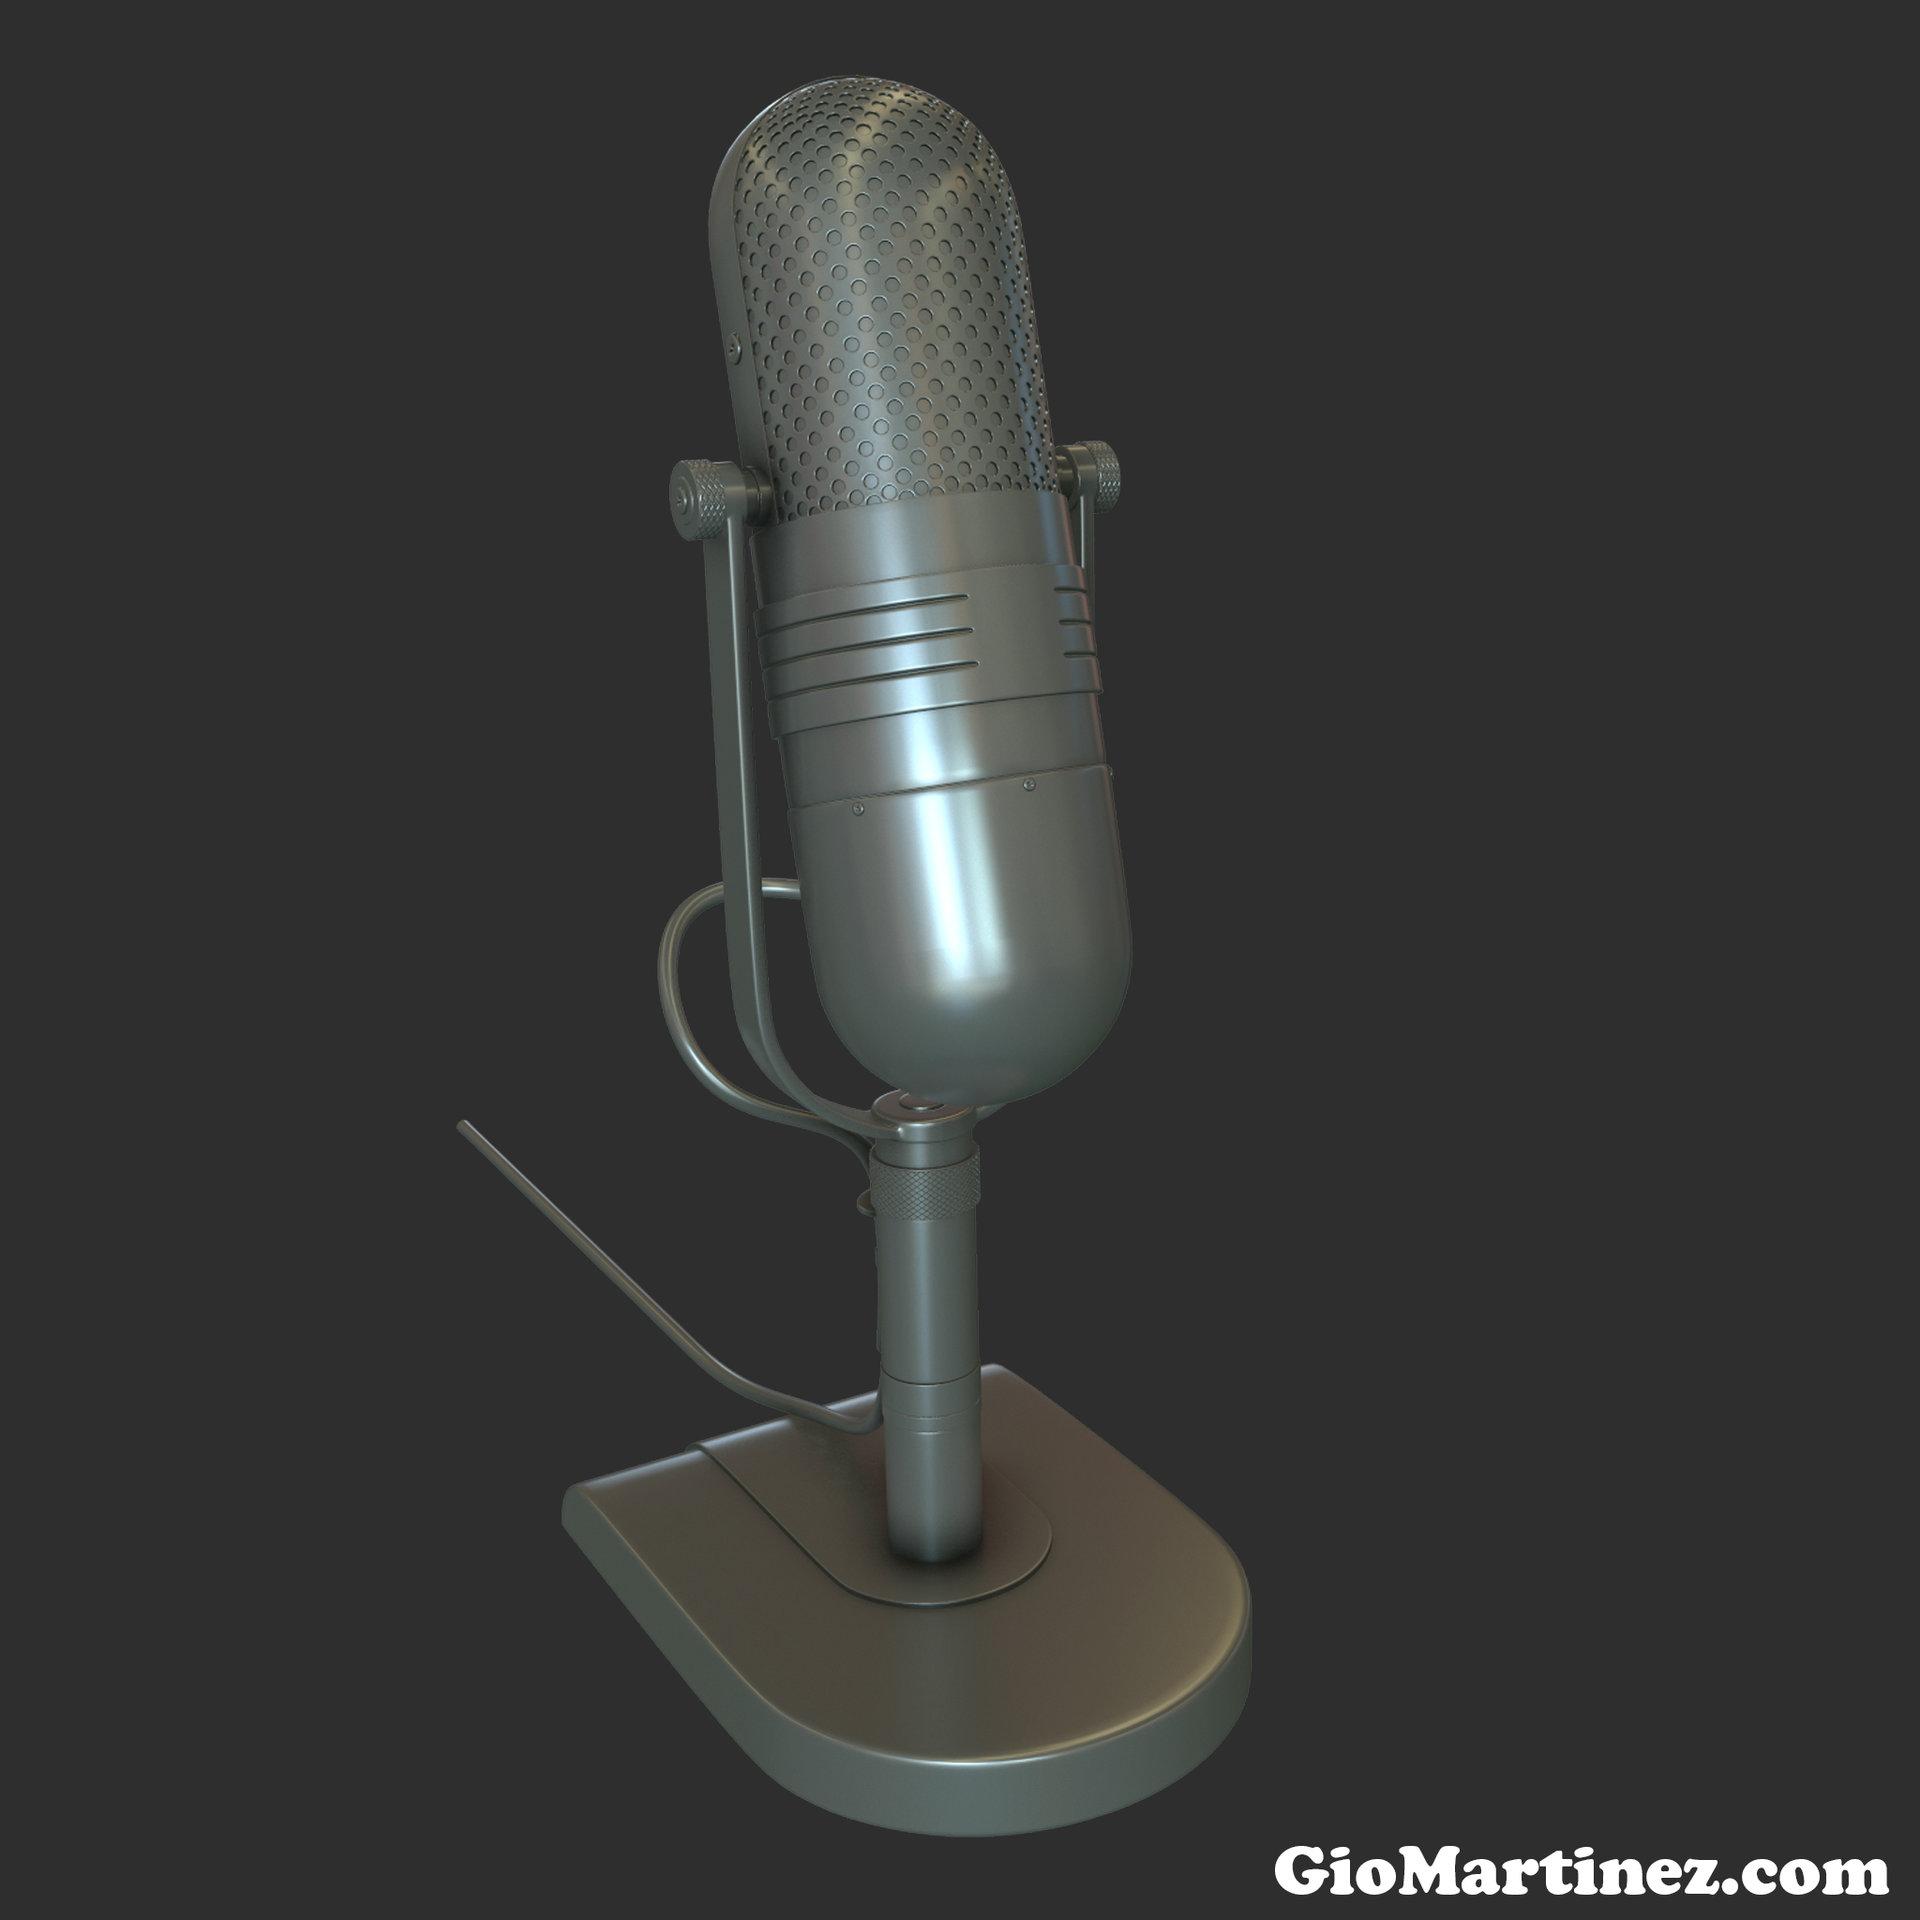 giovanni-martinez-radio-mic-final-high-rez.jpg?1431045187